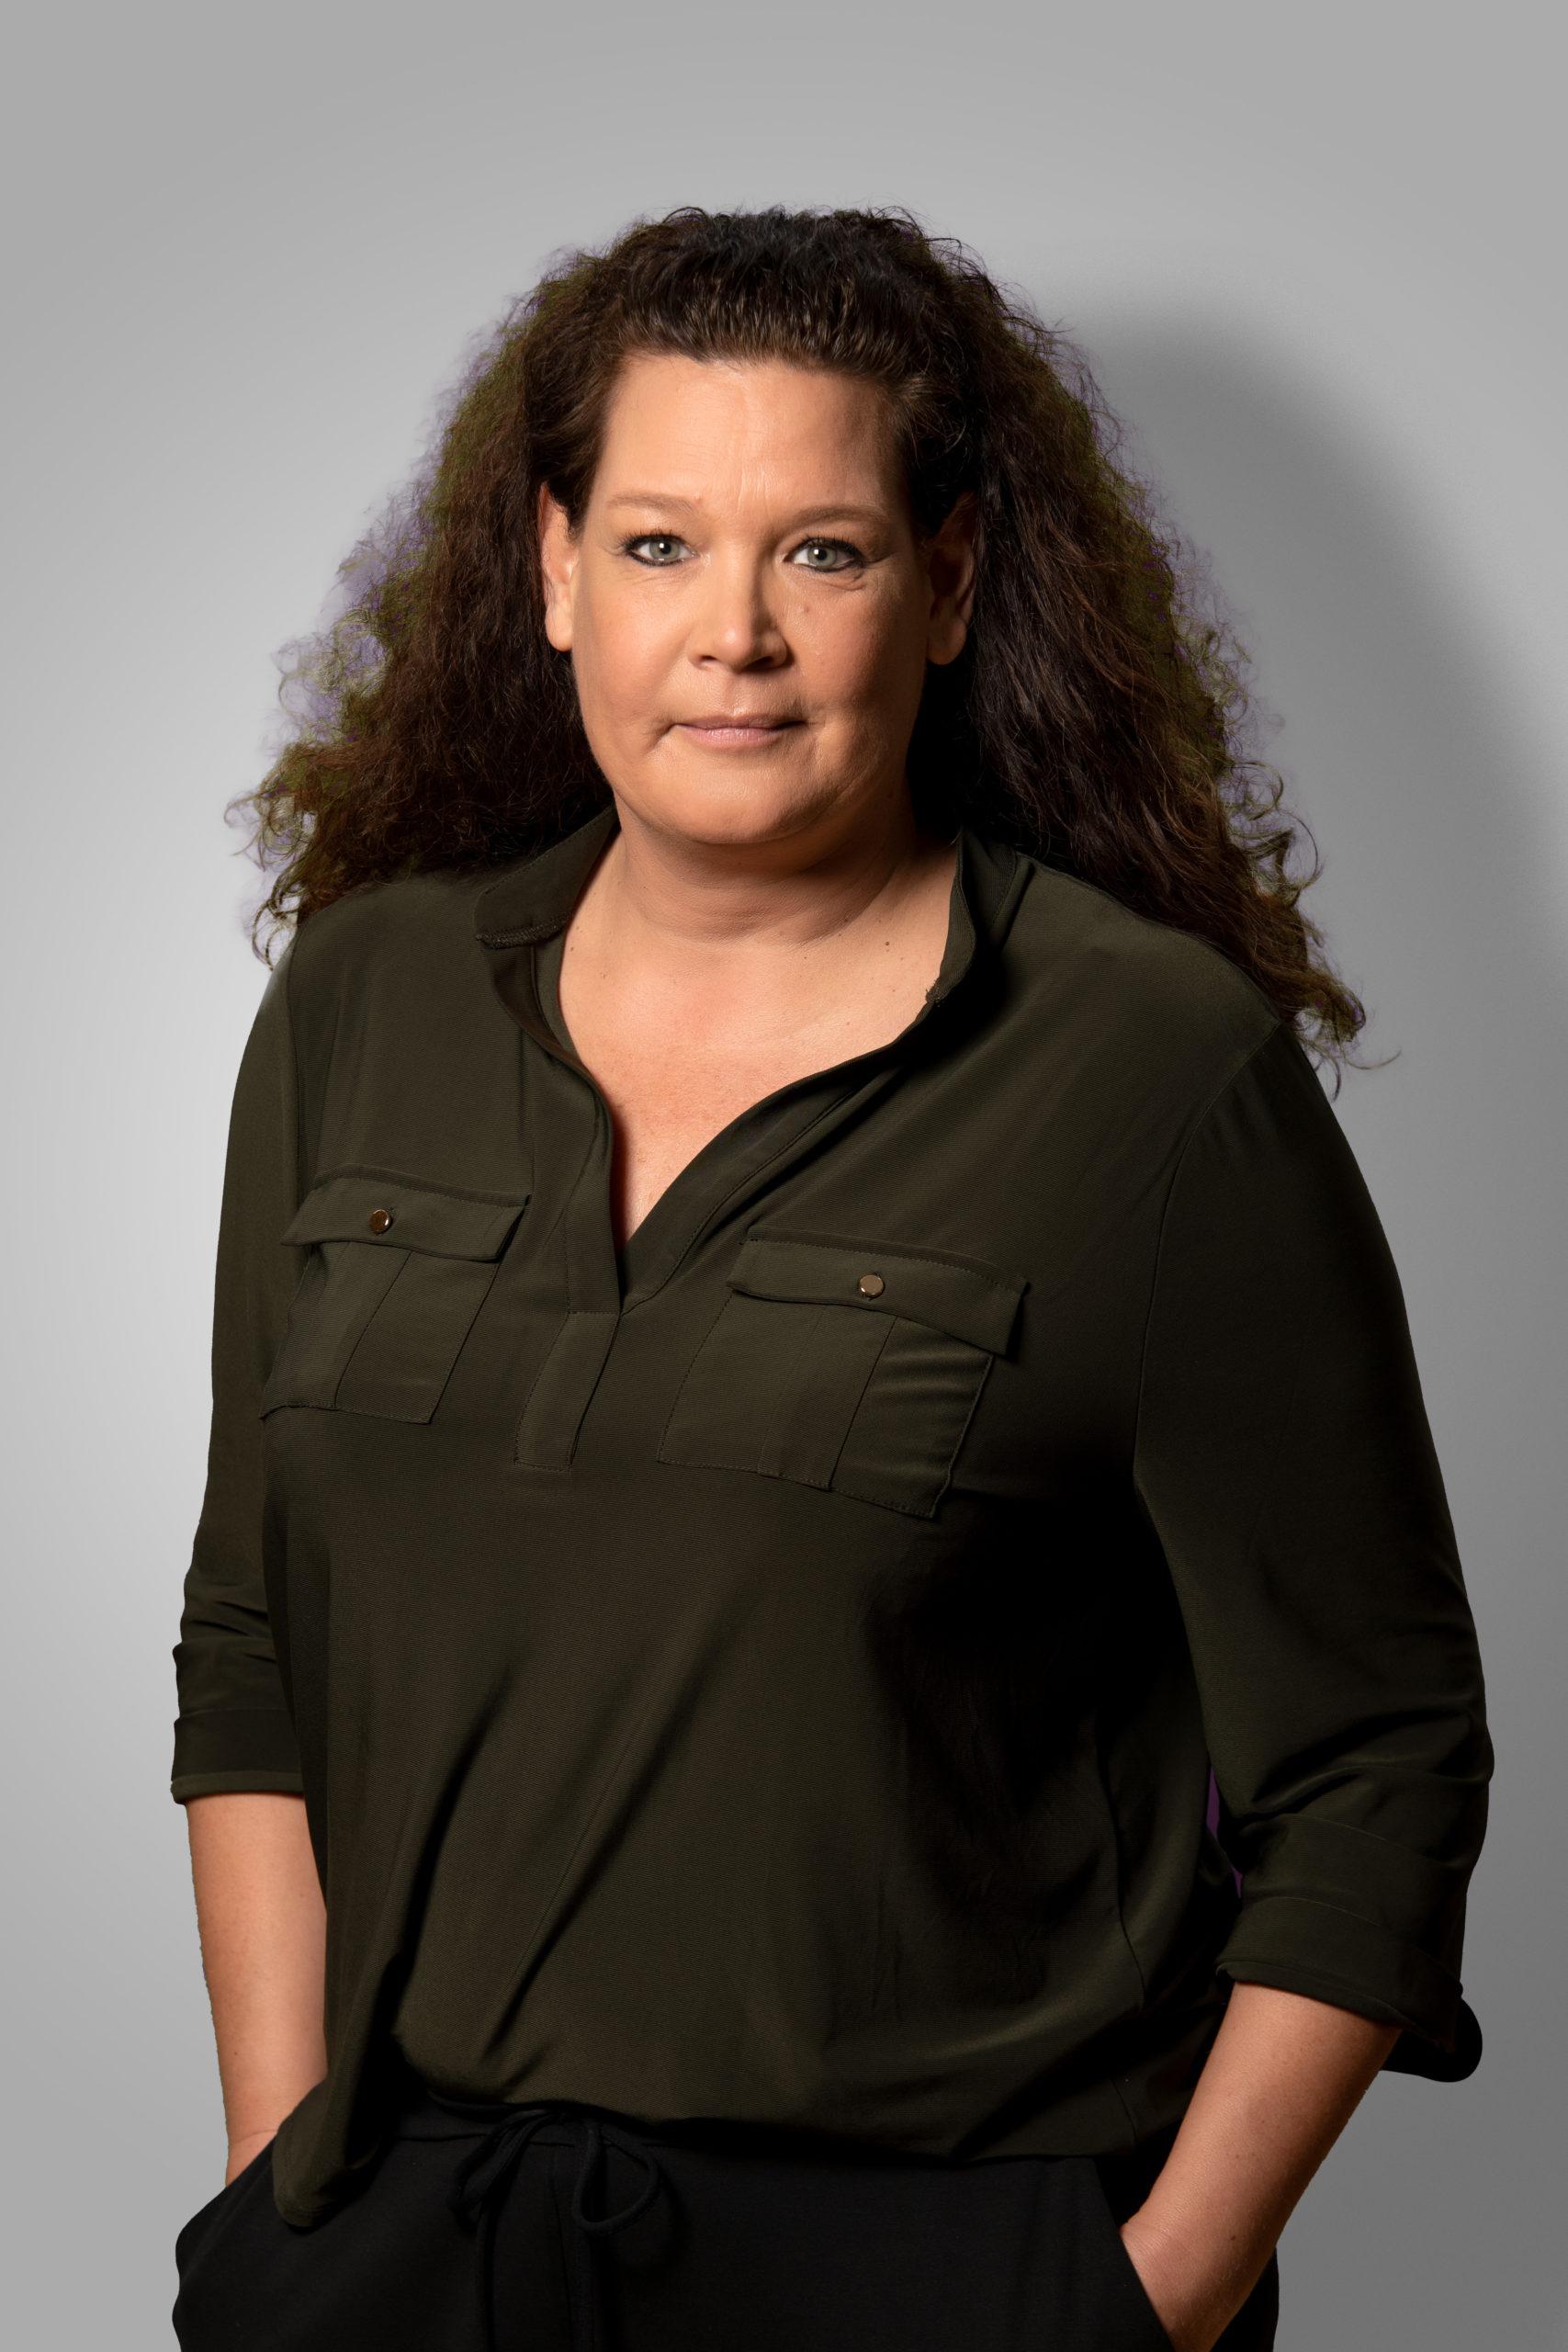 Daniela Meckmann-Tribian